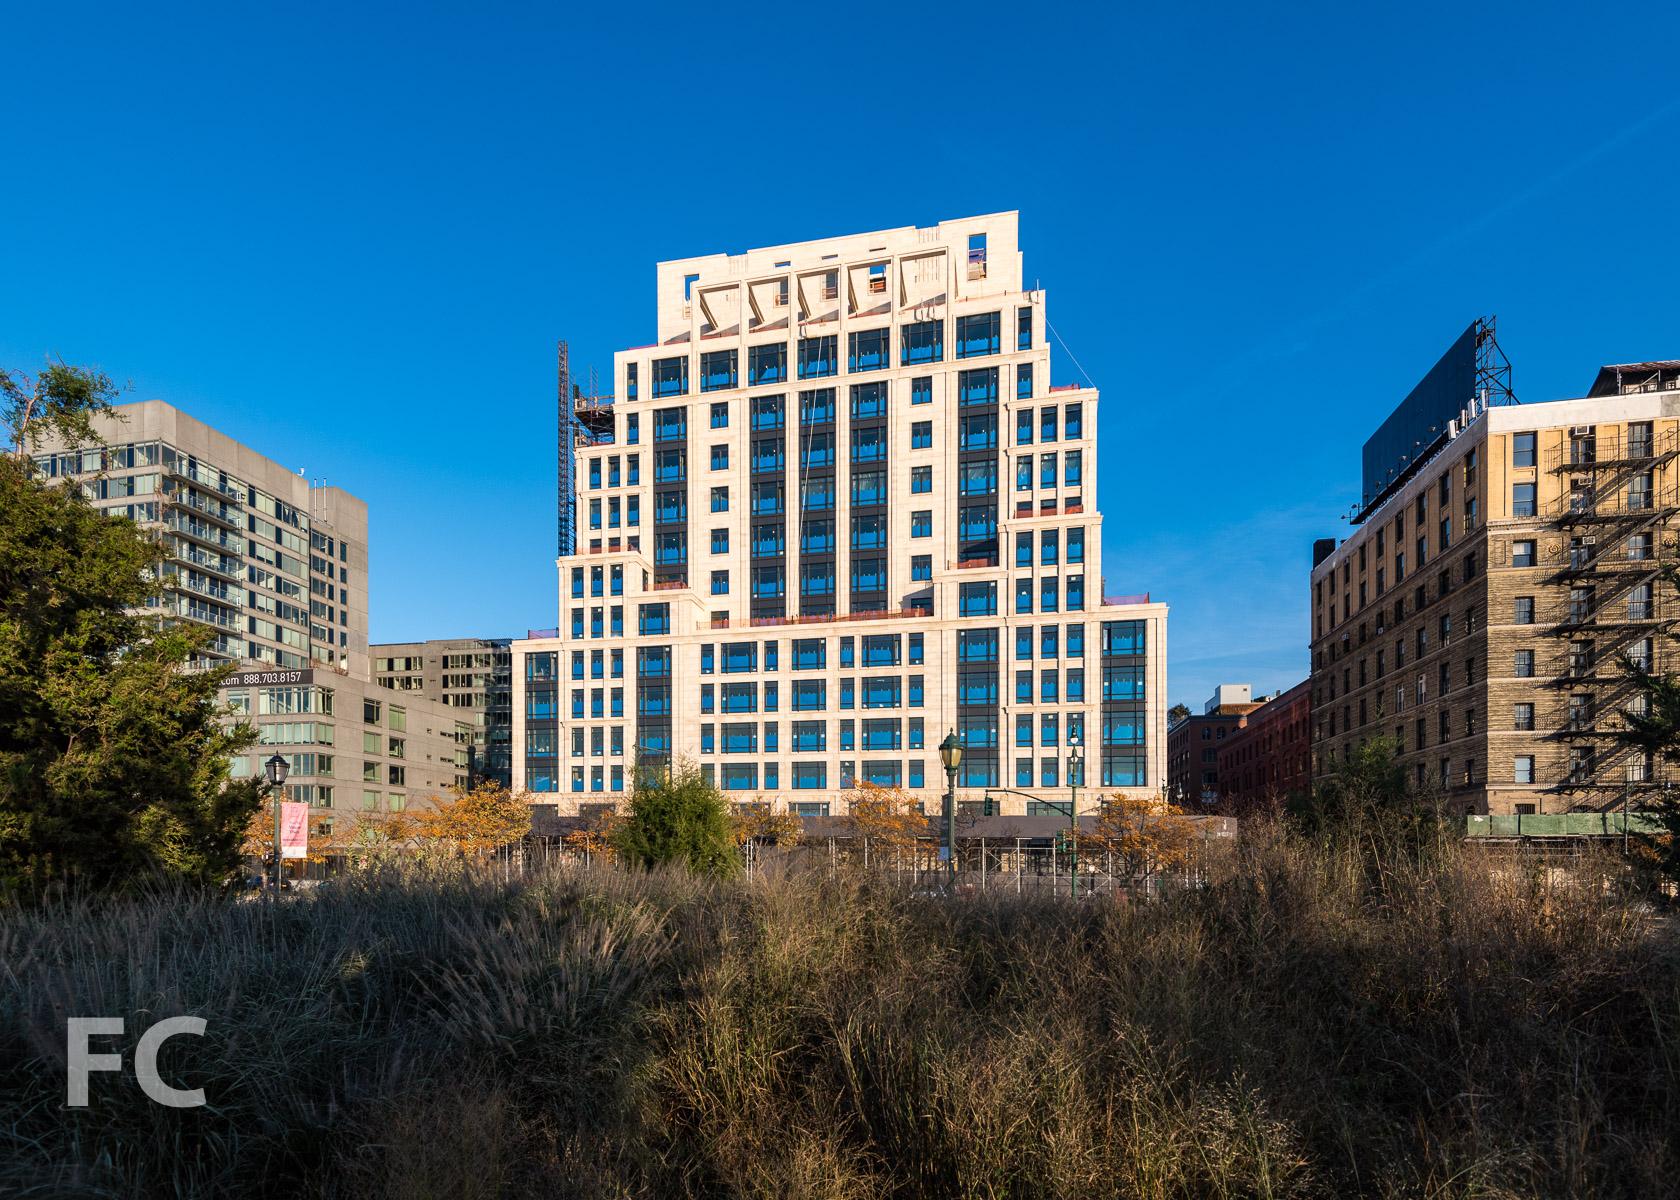 West façade from Hudson River Park.